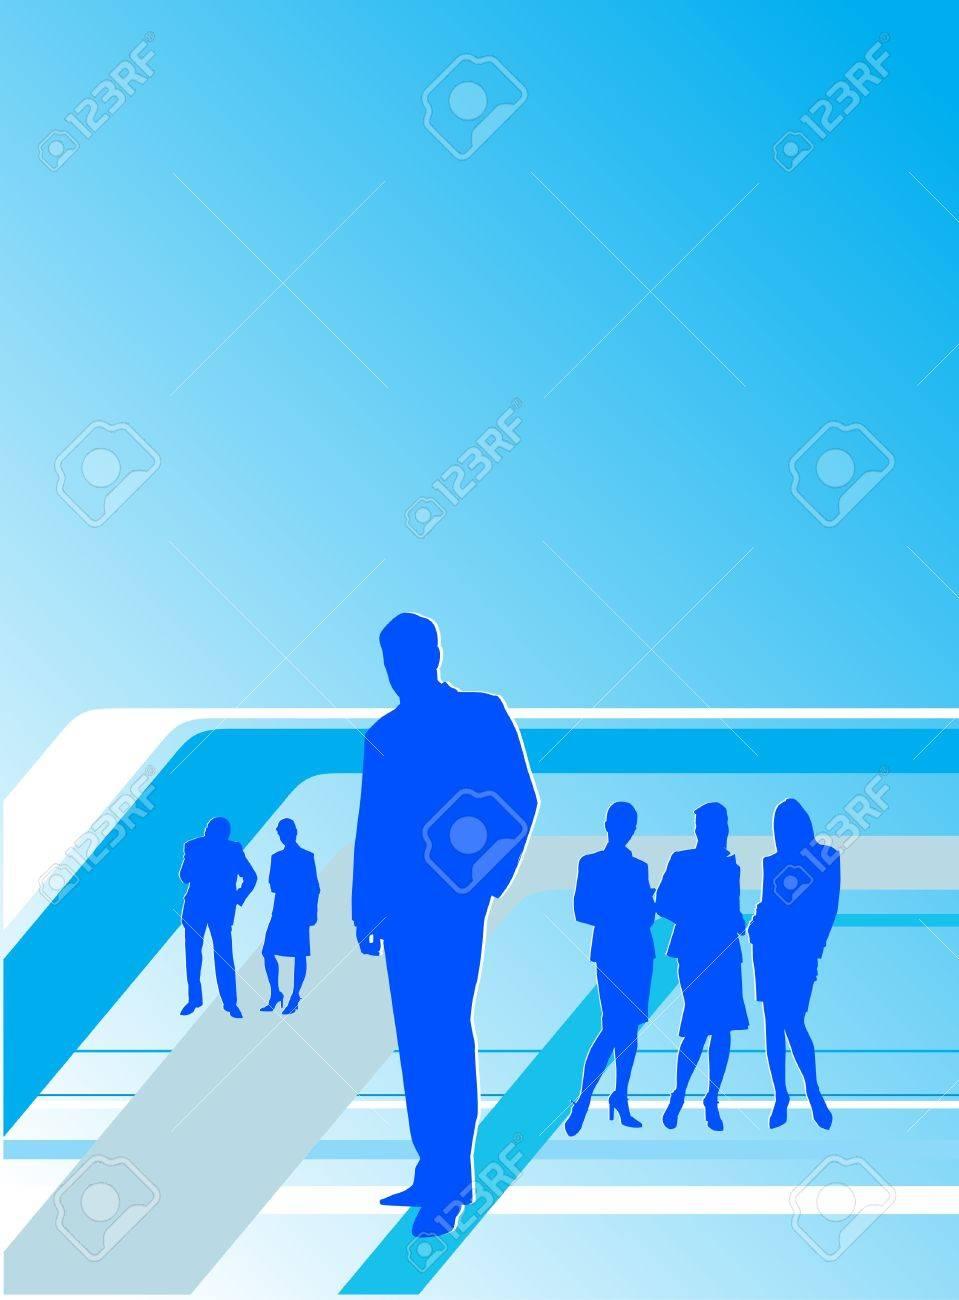 Illustration of team work. Busines people: profit, product, team. Stock Vector - 8687884